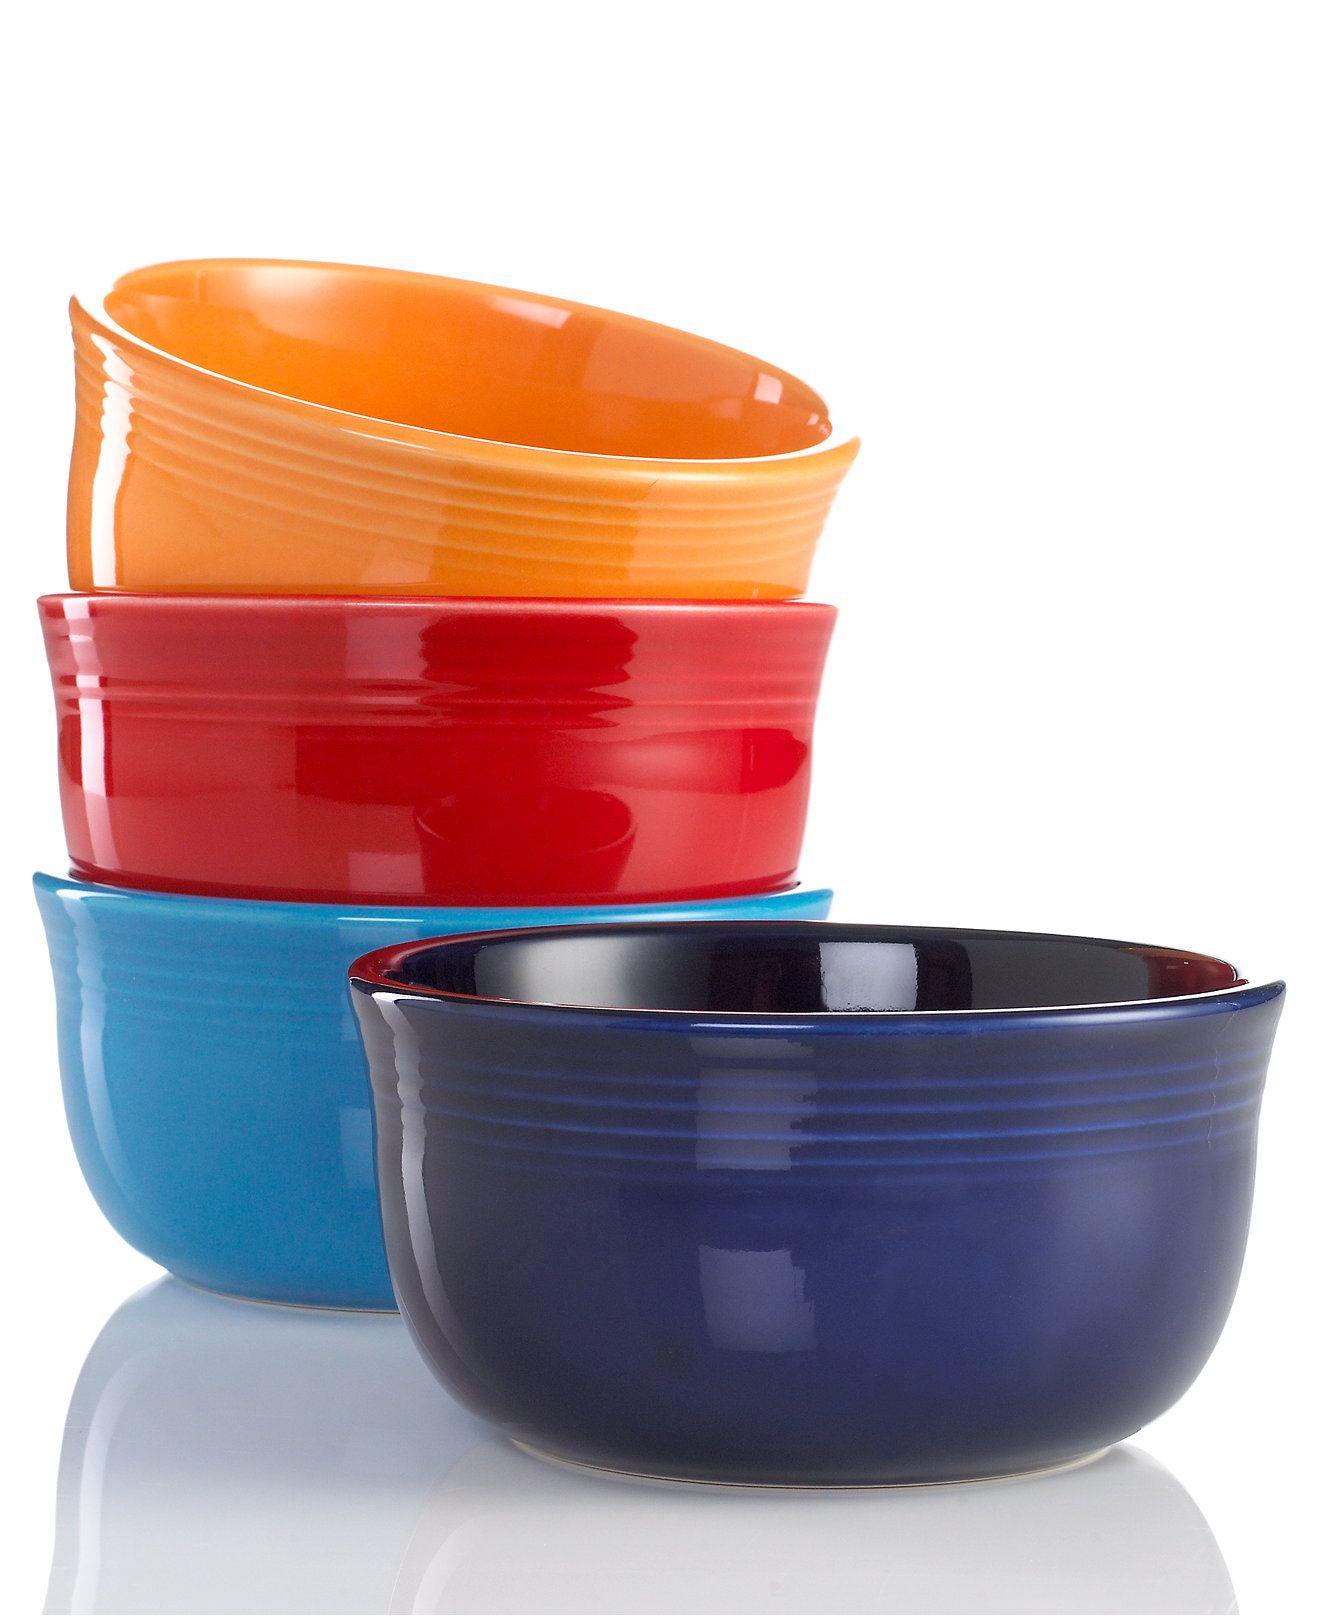 Gusto Bowls - Fiesta Dinnerware - Dining u0026 Entertaining - Macyu0027s  sc 1 st  Pinterest & Fiesta 28-oz. Gusto Bowls Collection | Gusto Fiestas and Dinnerware